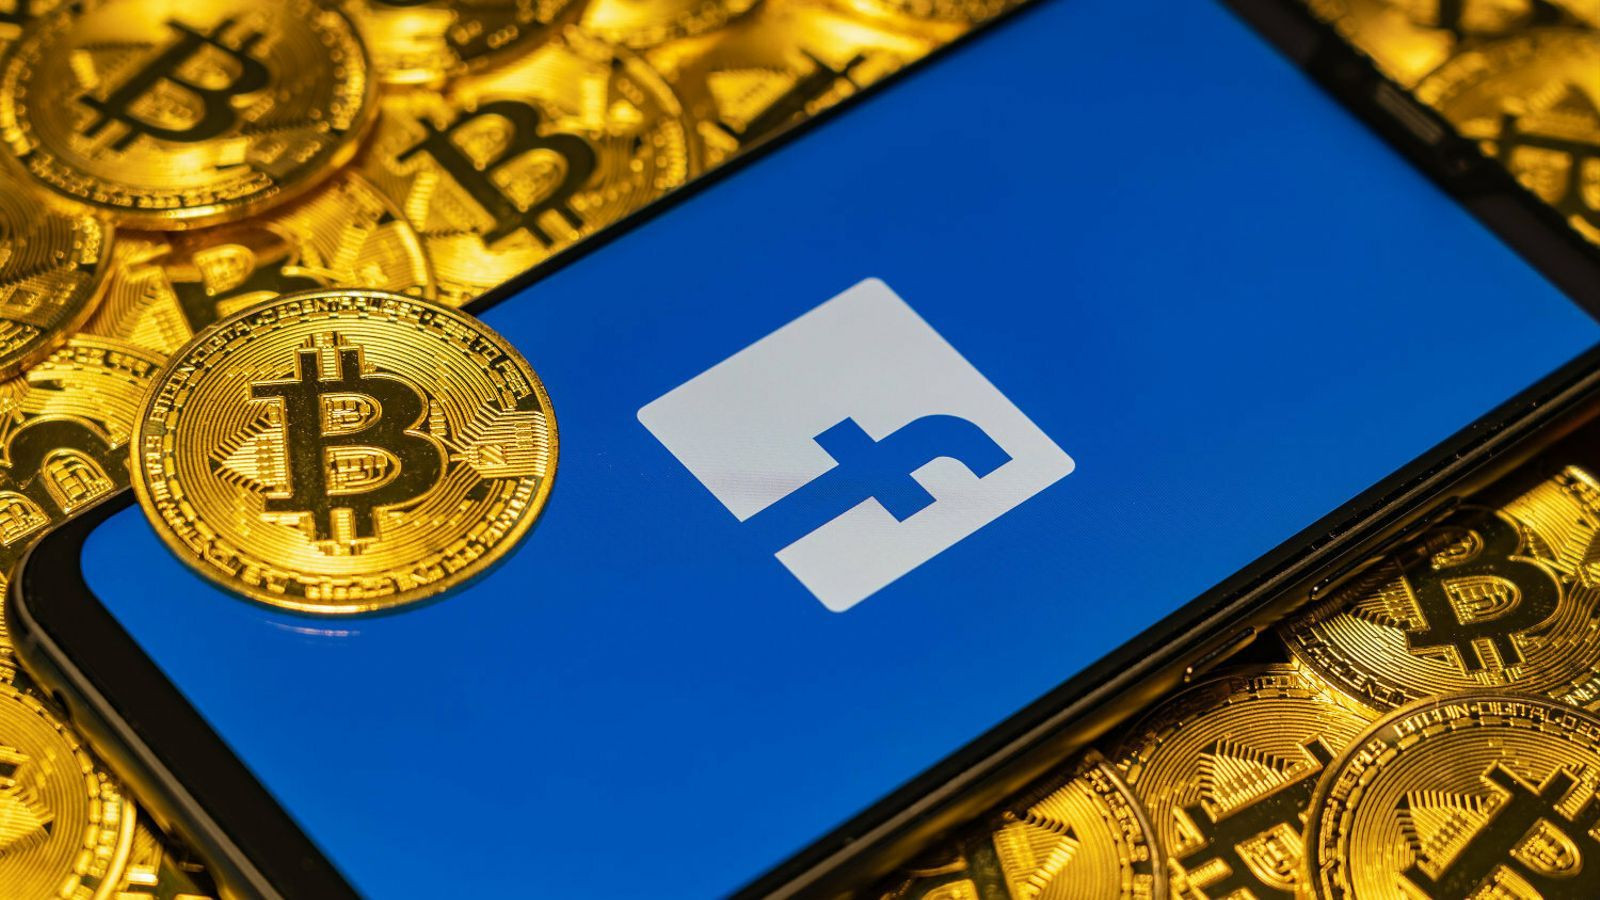 Brussel·les ja investiga la criptomoneda de Facebook